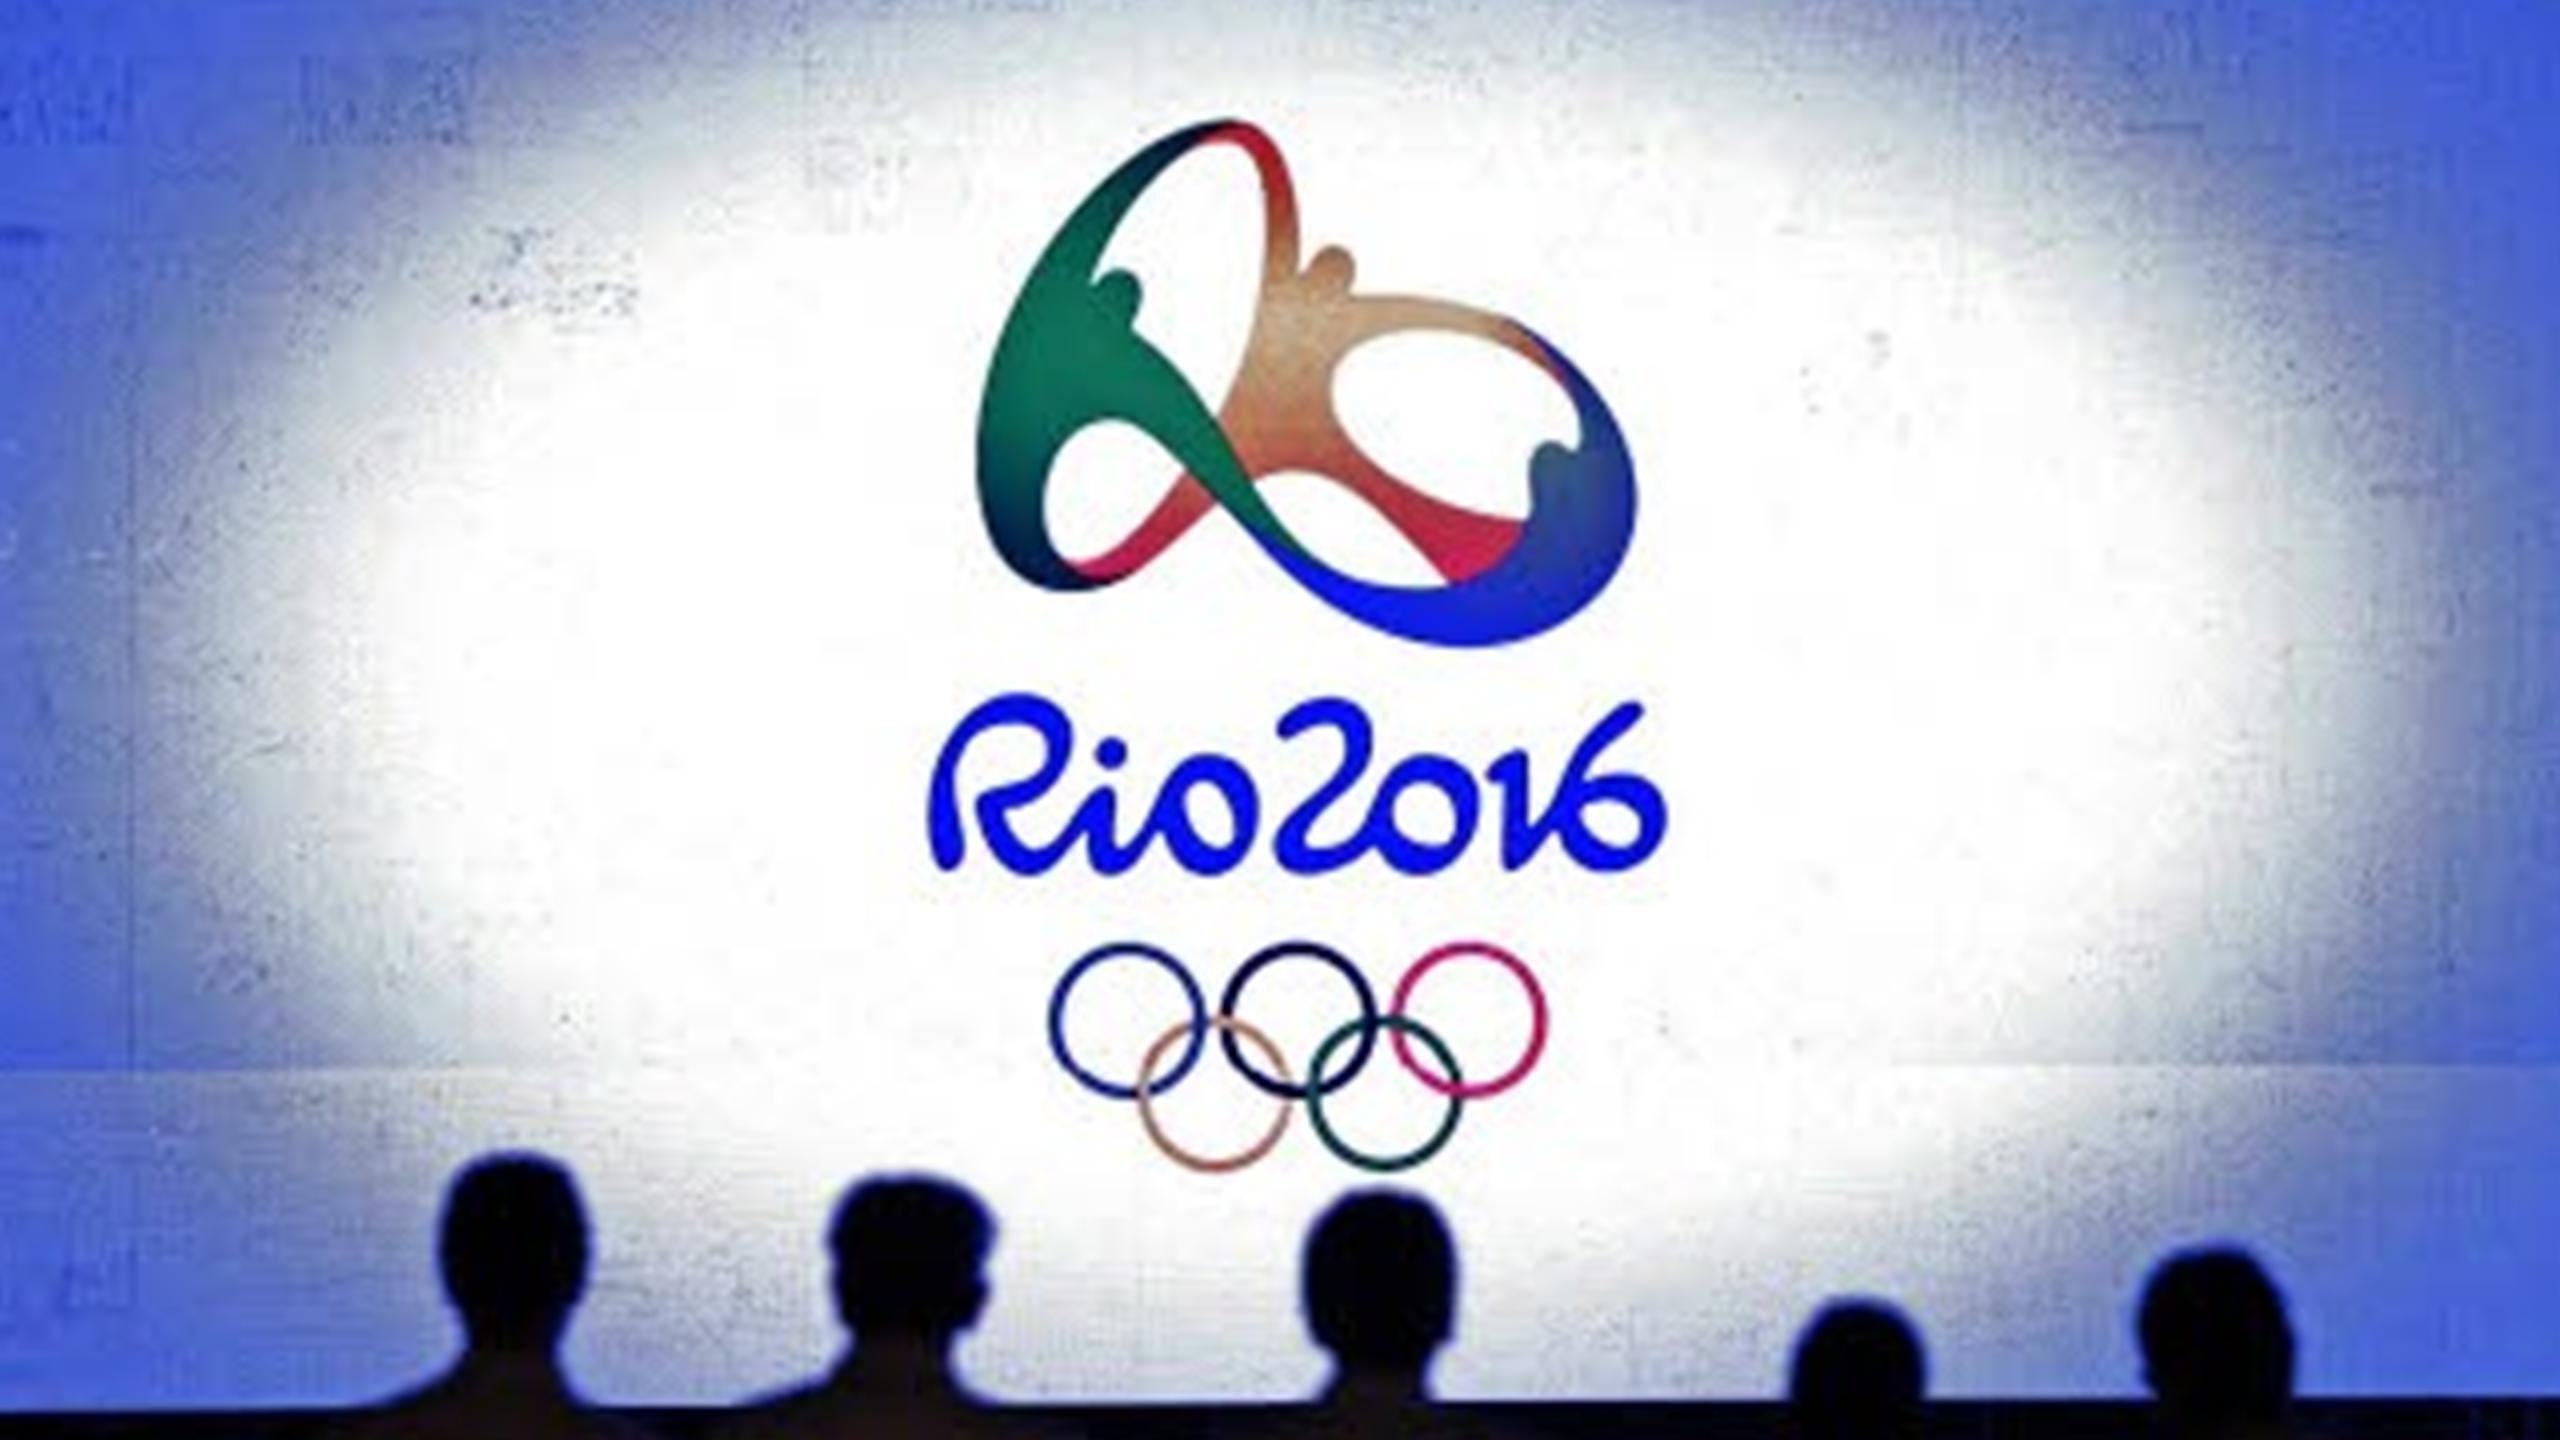 Calendario De Los Juegos Olímpicos De Río De Janeiro 2016 Eurosport